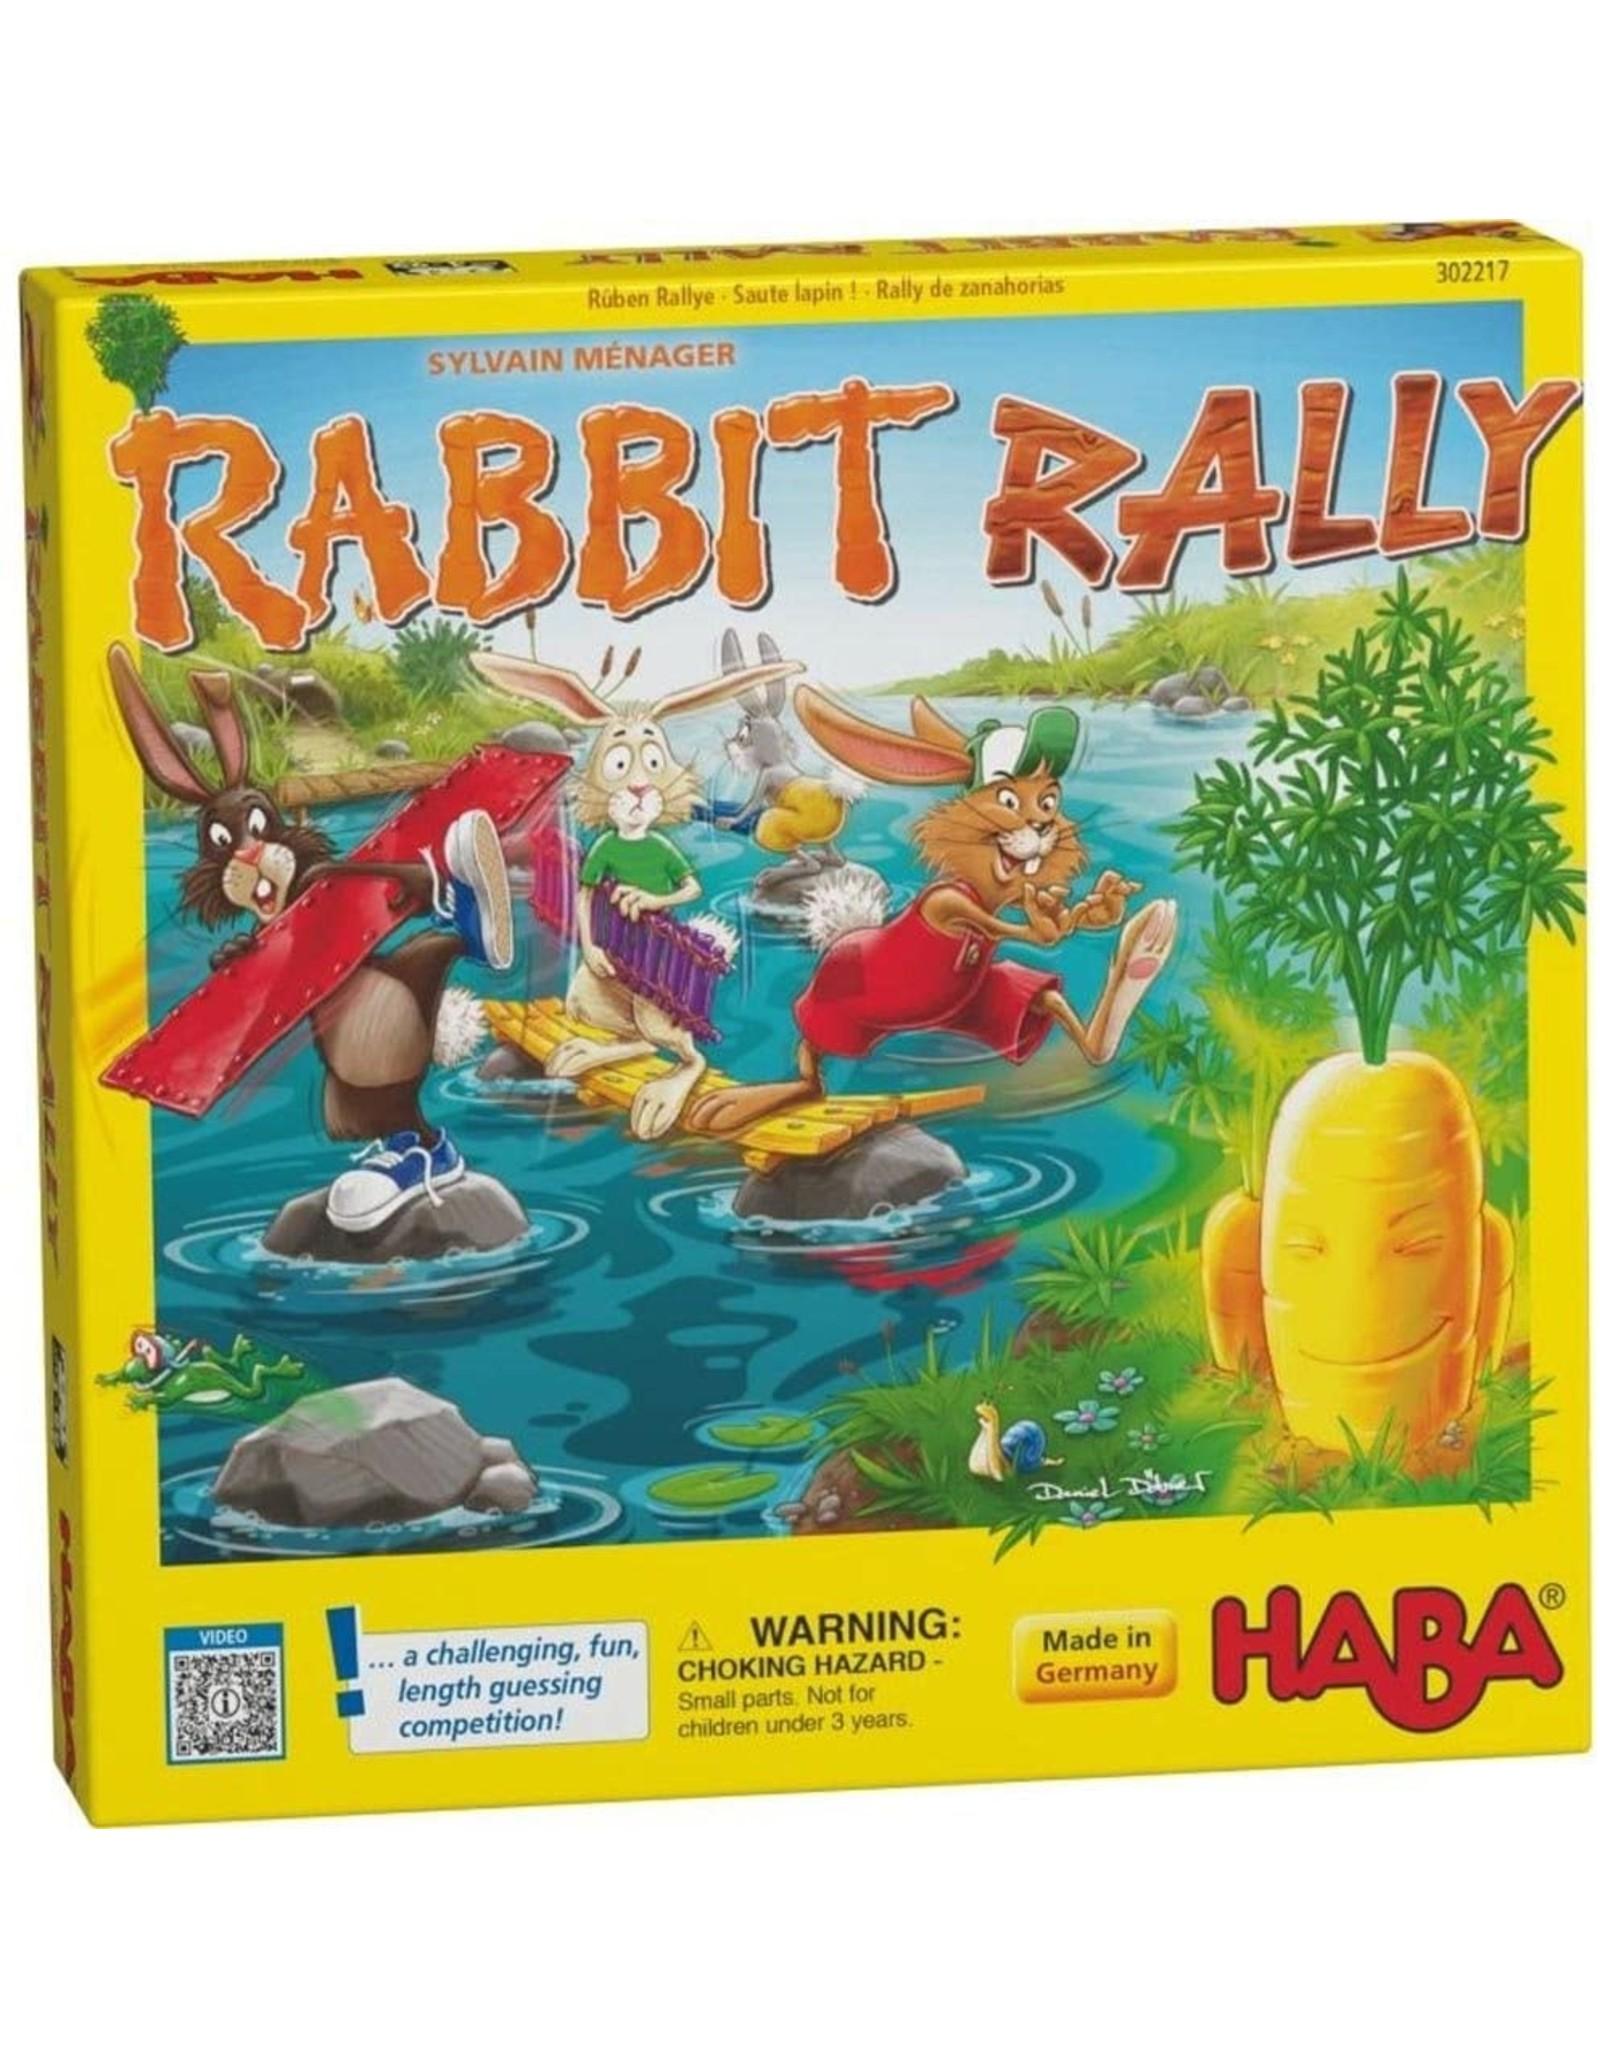 HABA GAMES RABBIT RALLY